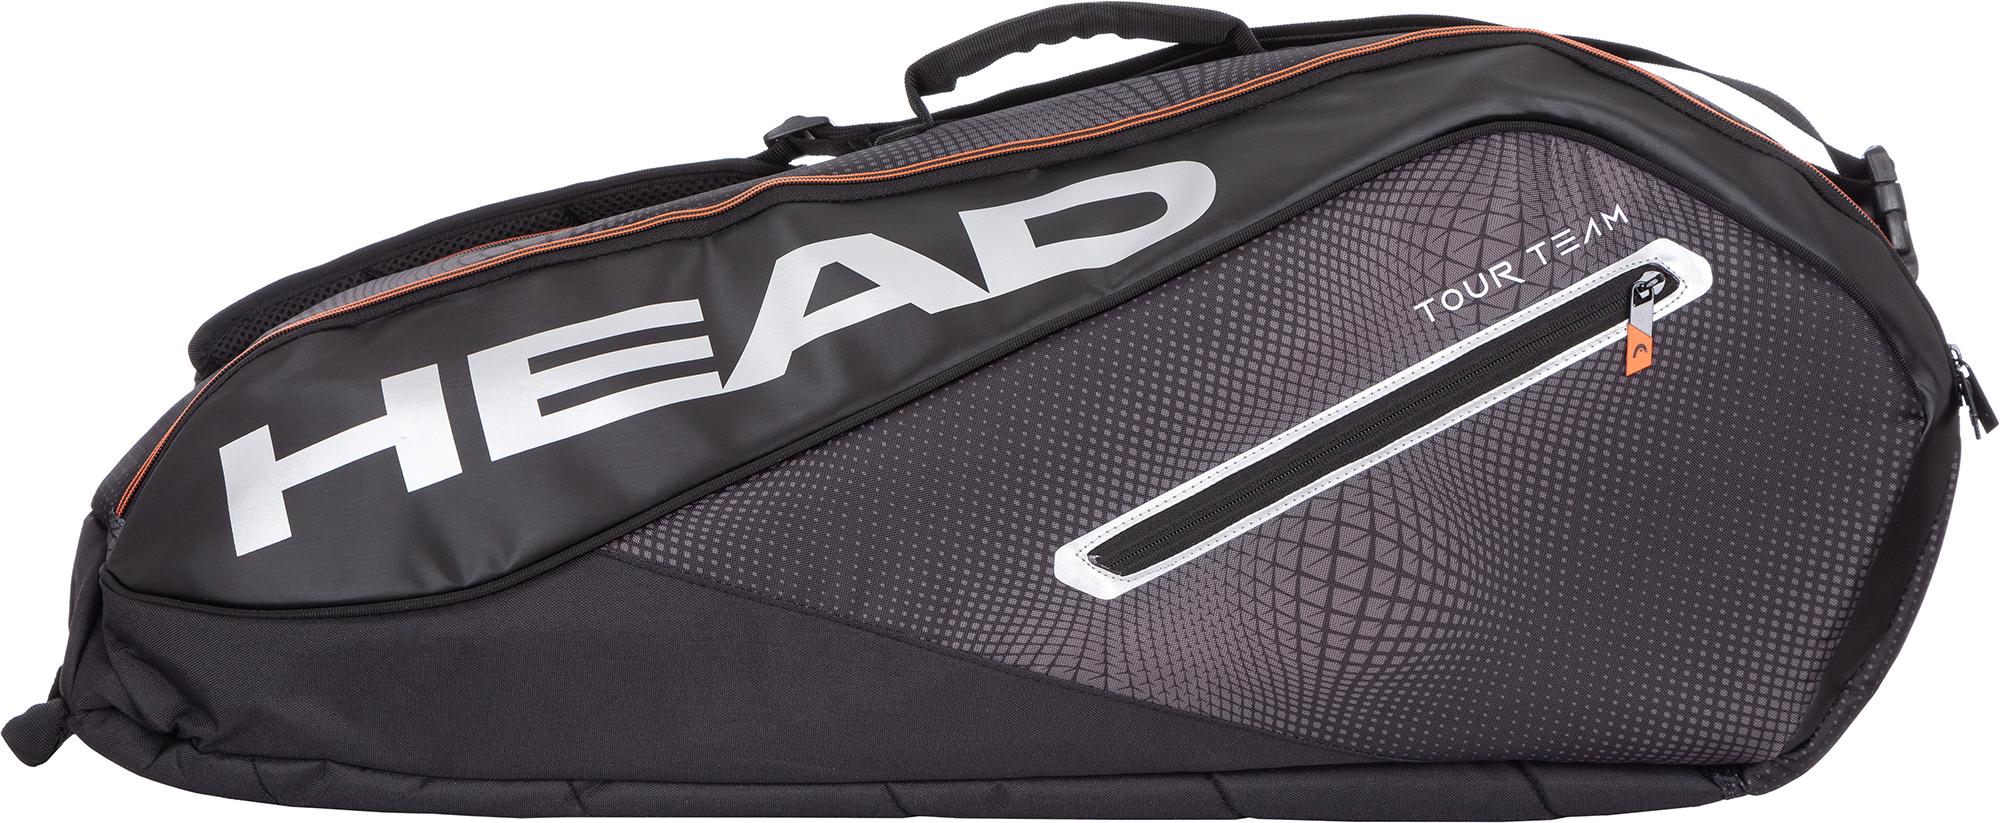 цена на Head Сумка для 6 ракеток Head Tour Team 6R Combi